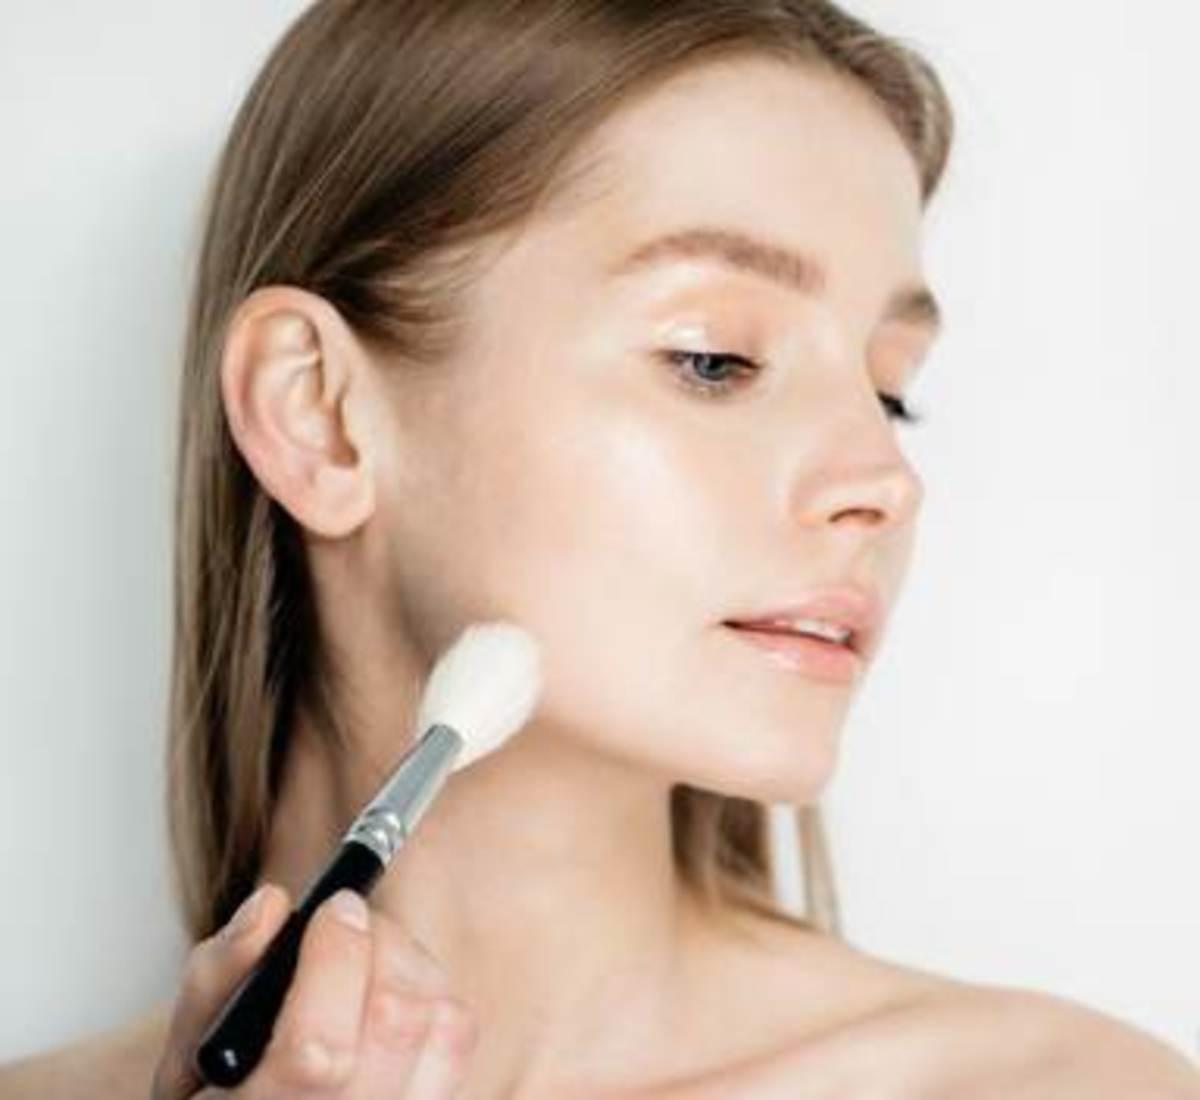 Apply Transparent Matte Face Powder to Control Oil, Blur Pores & Set Makeup